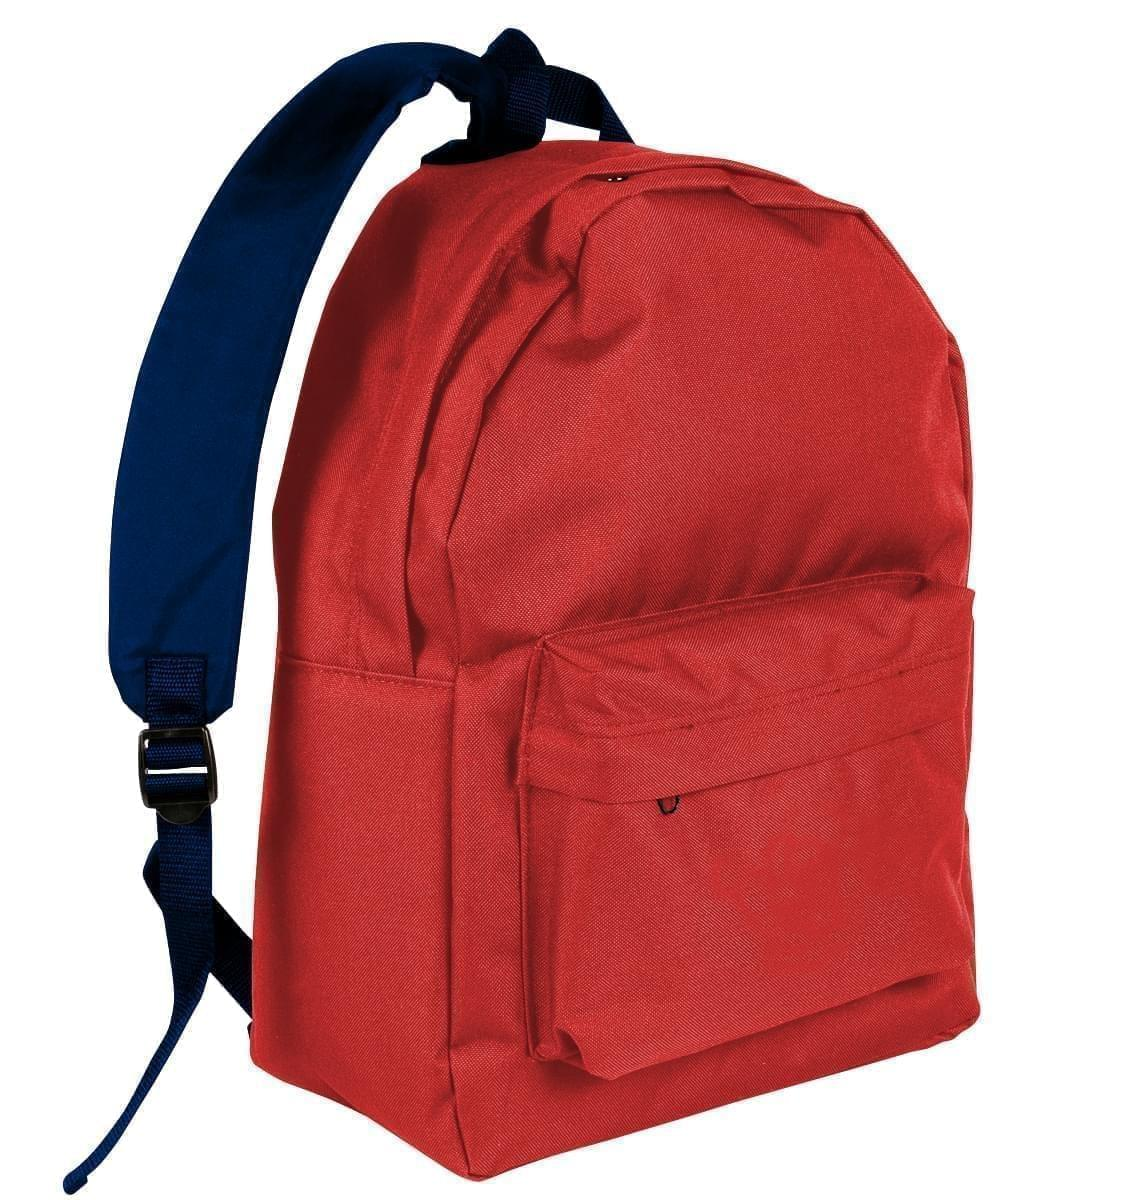 USA Made Nylon Poly Backpack Knapsacks, Red-Navy, 8960-AZZ